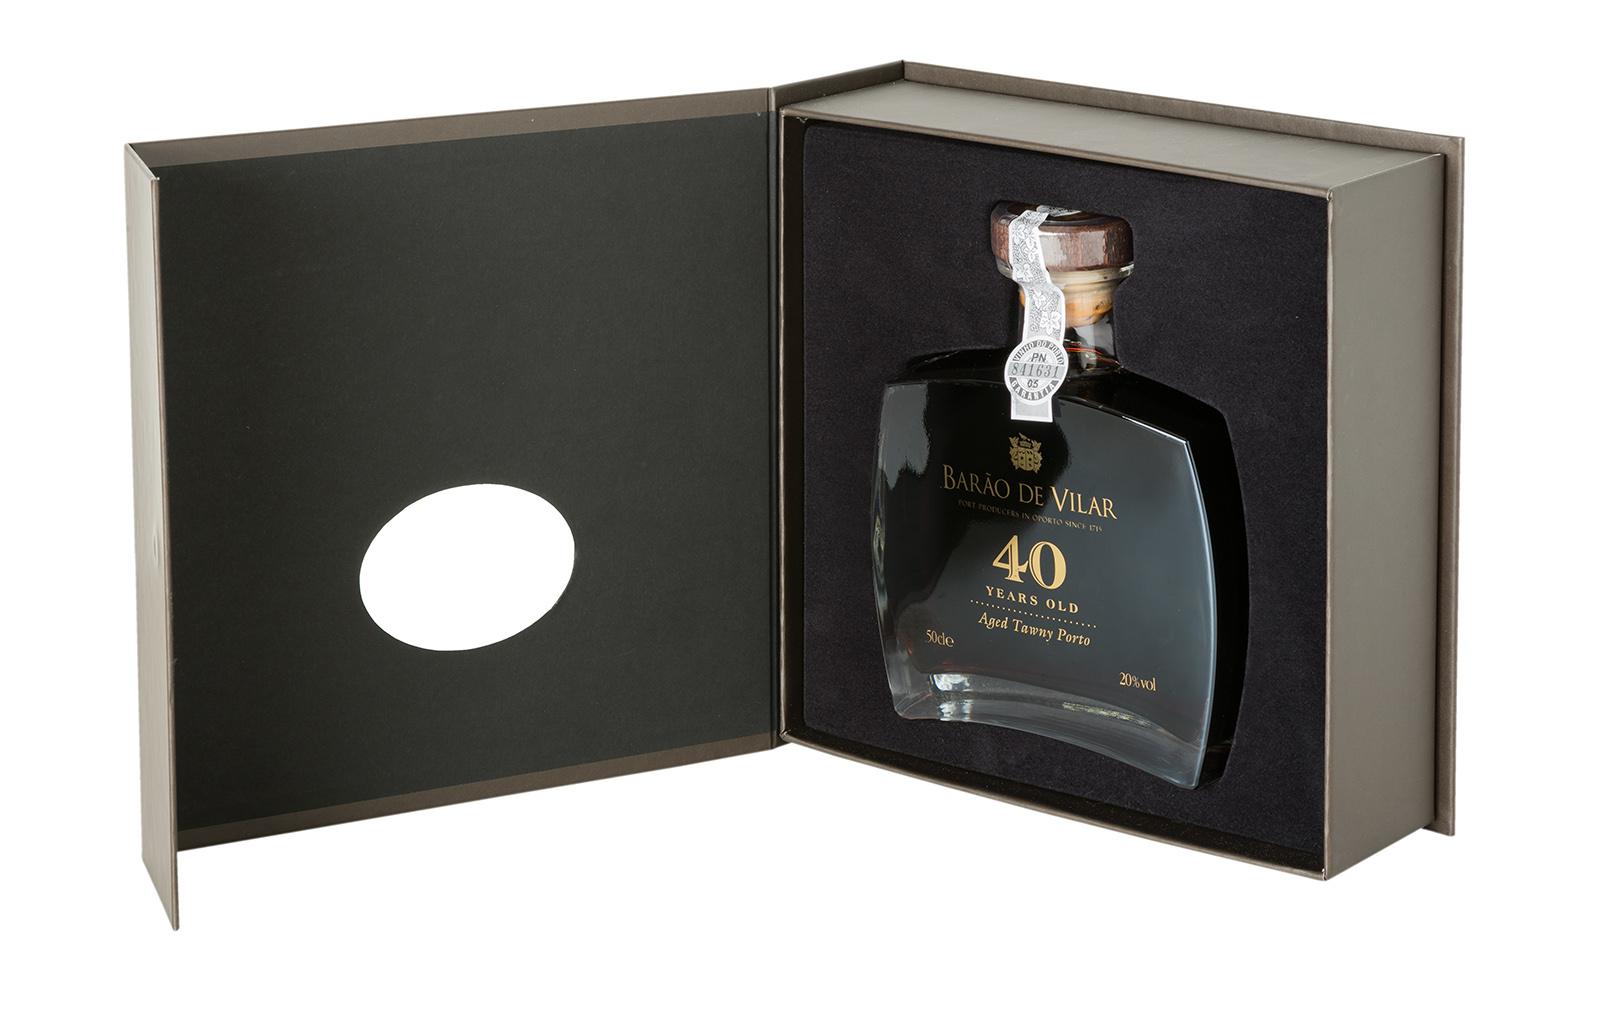 Barão de Vilar 40 Years Old 50cl Callisto & Gift Box.jpg